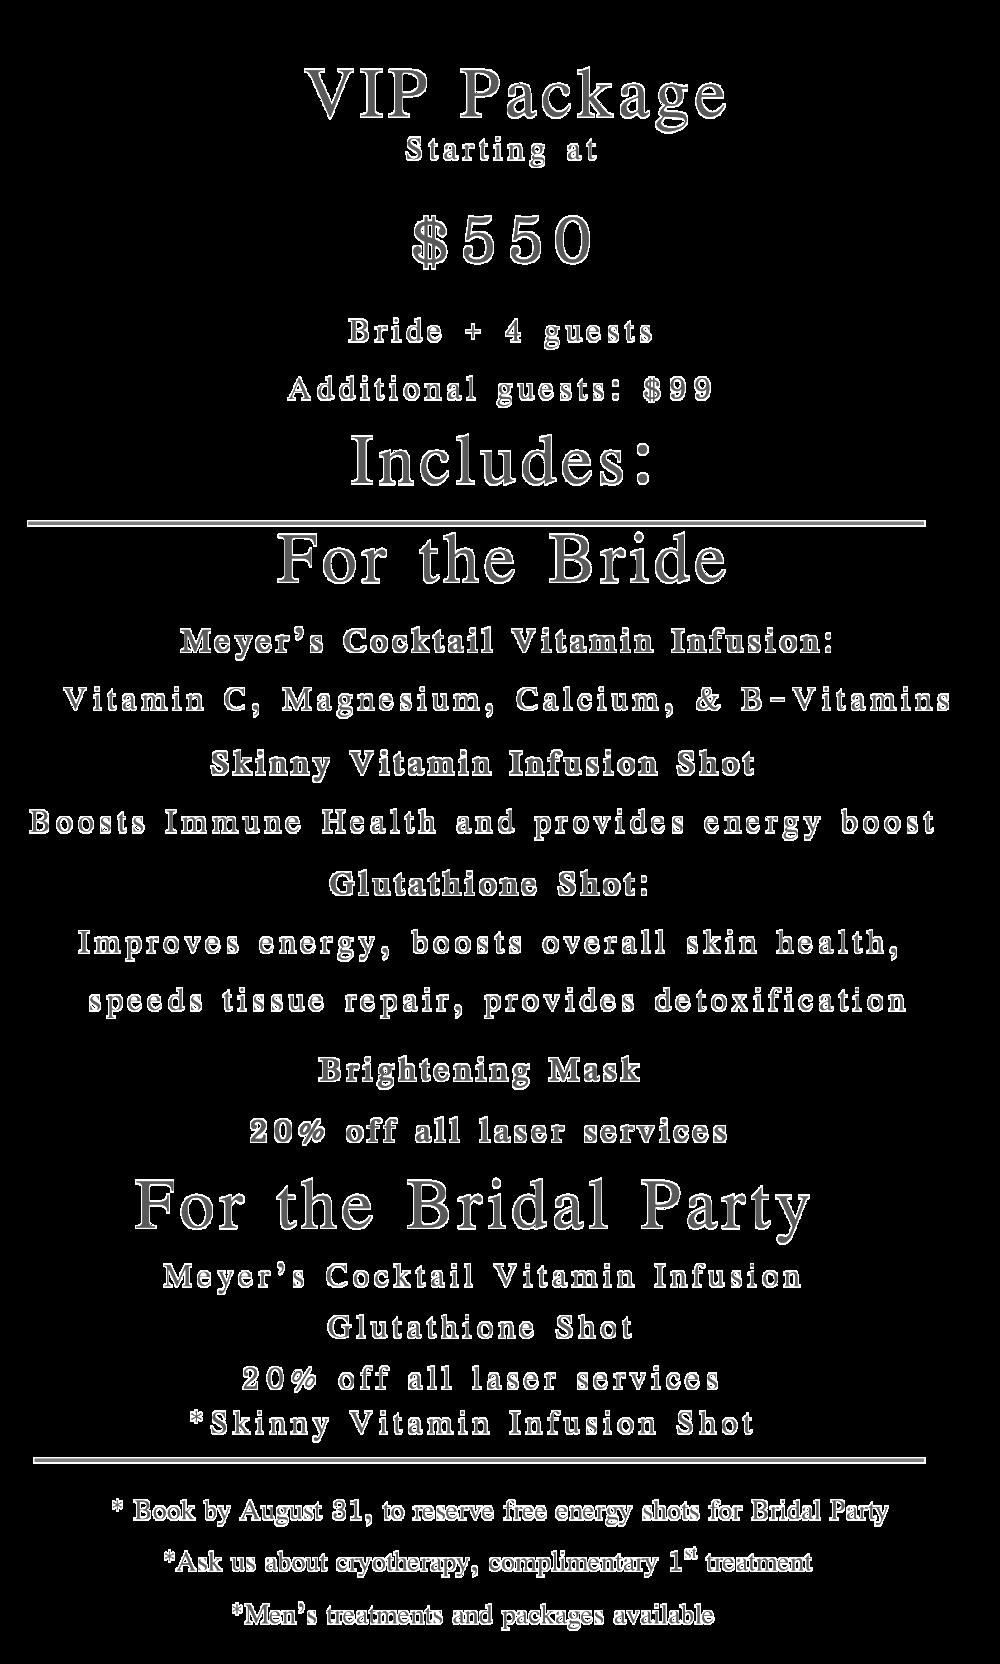 bride2.png